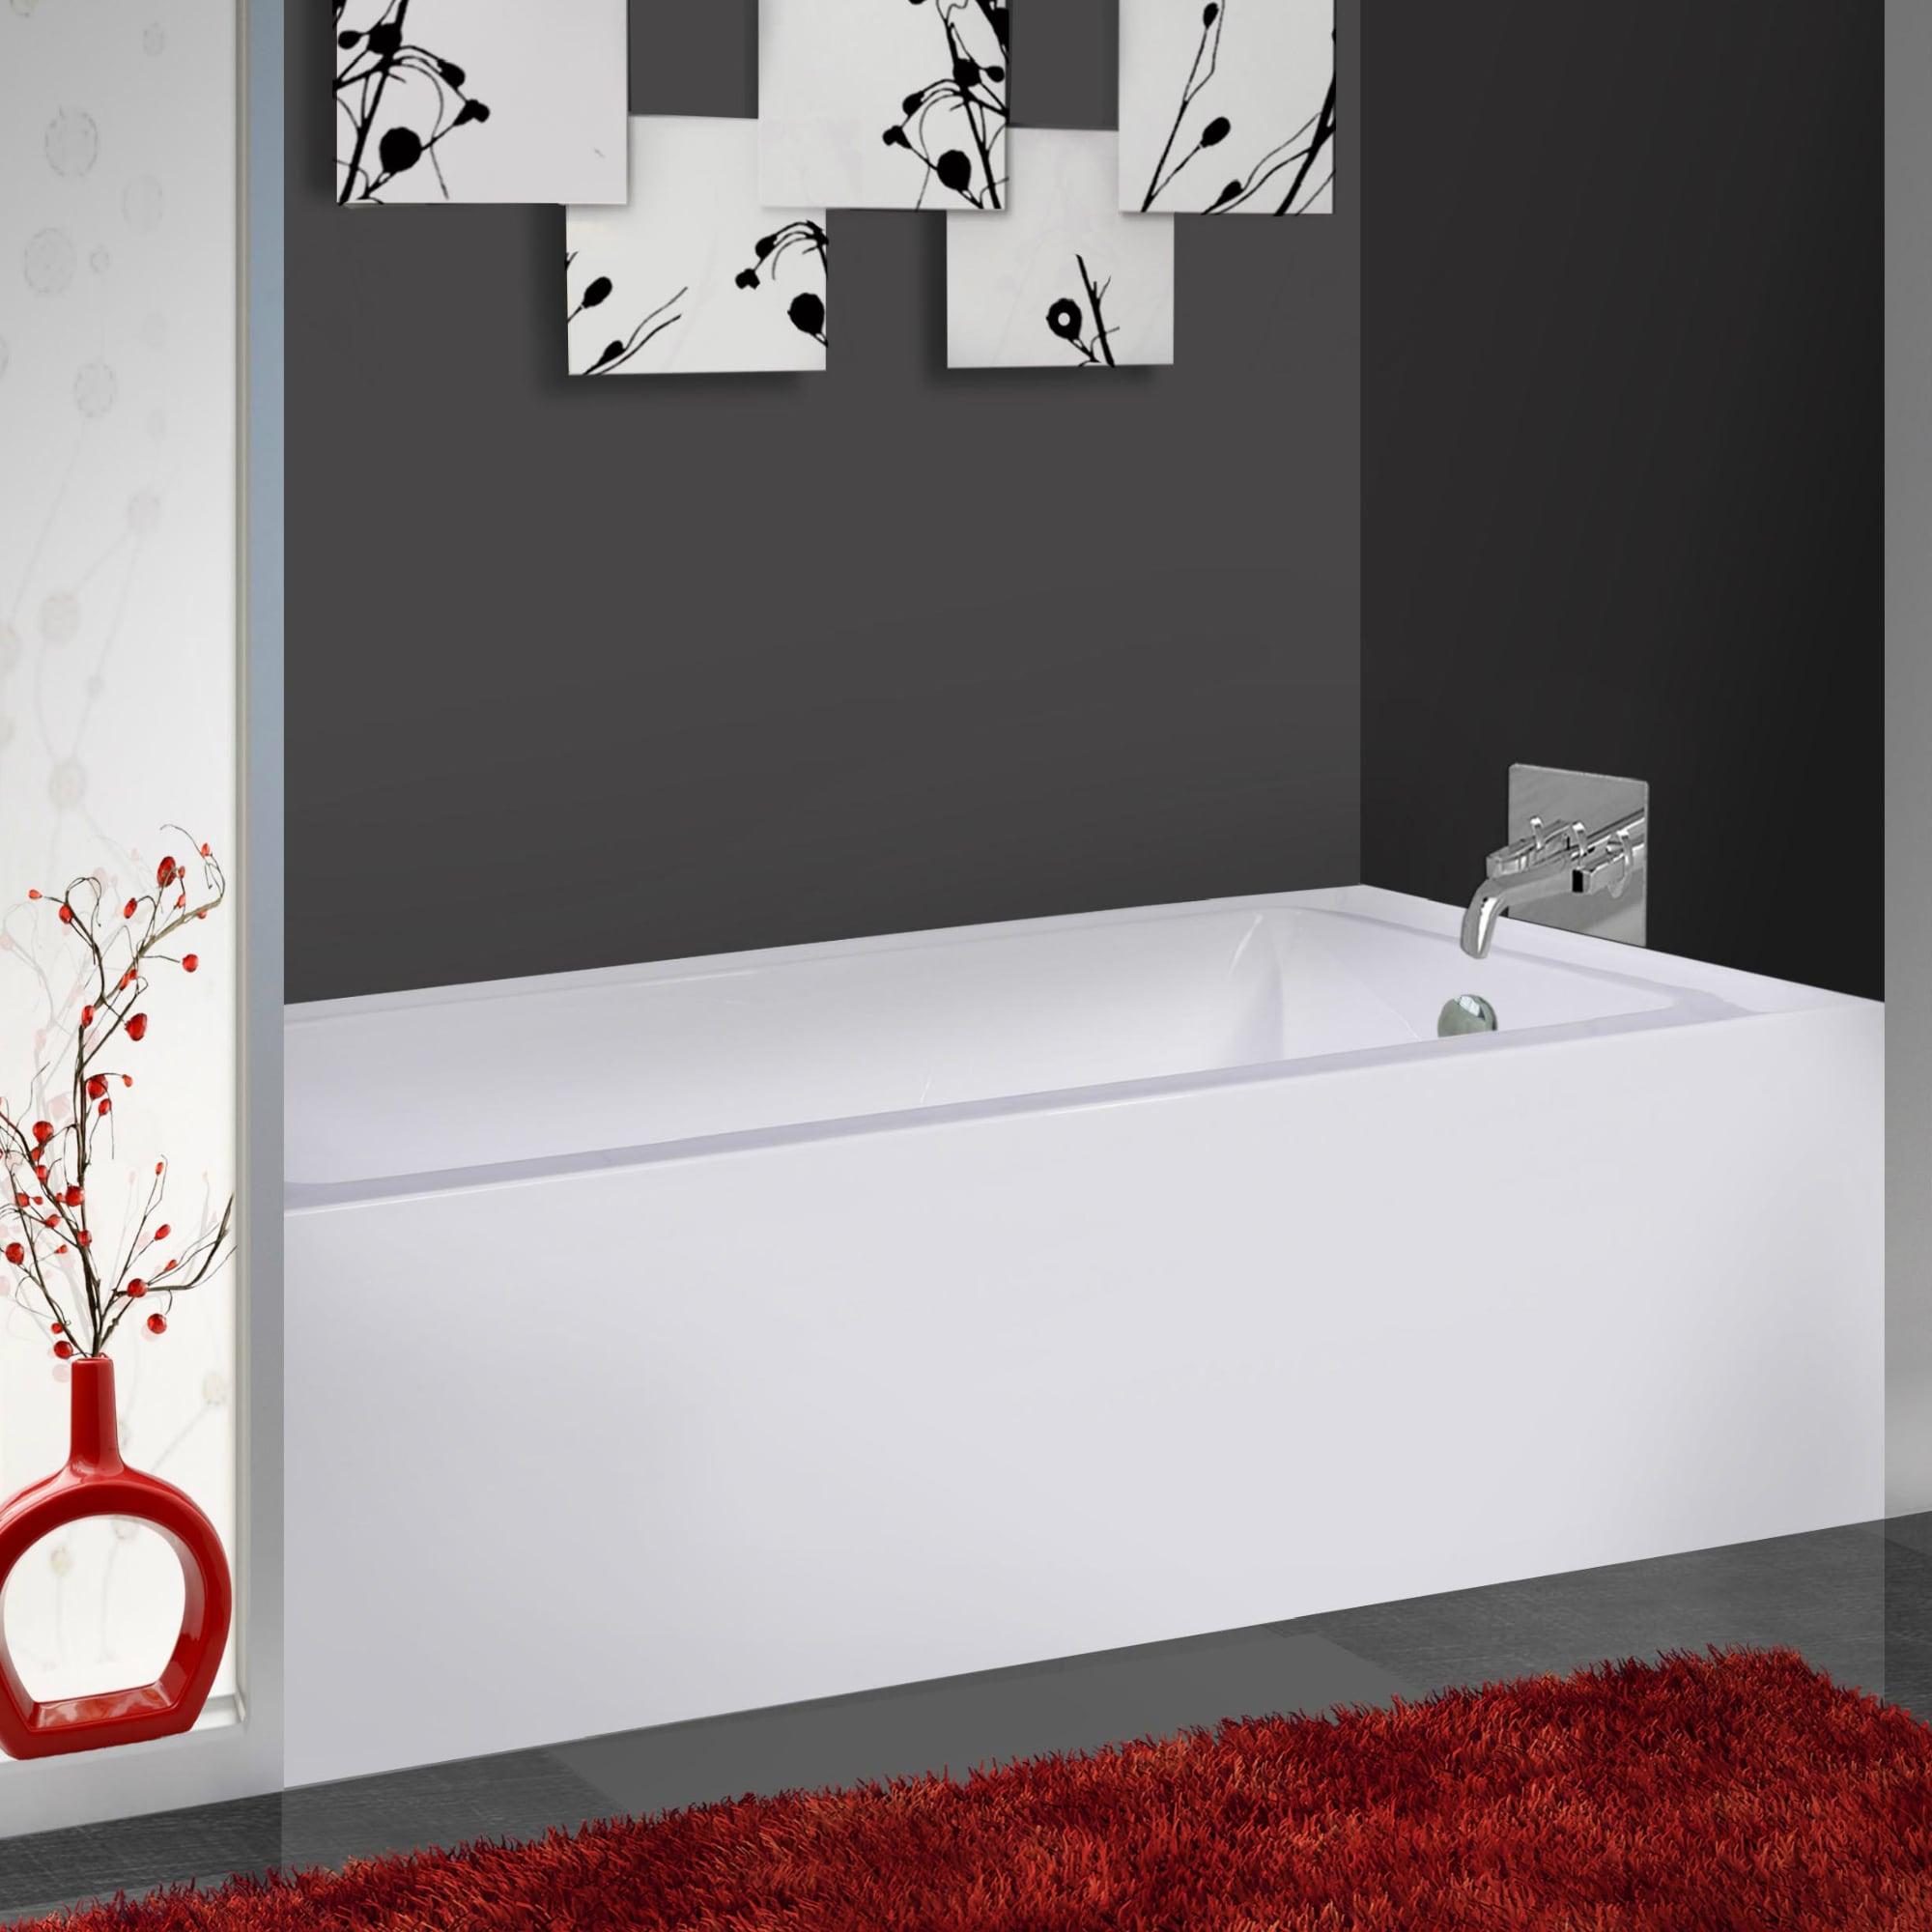 Fine Fixtures White Acrylic 60-inch Rectangle Soaking Bat...